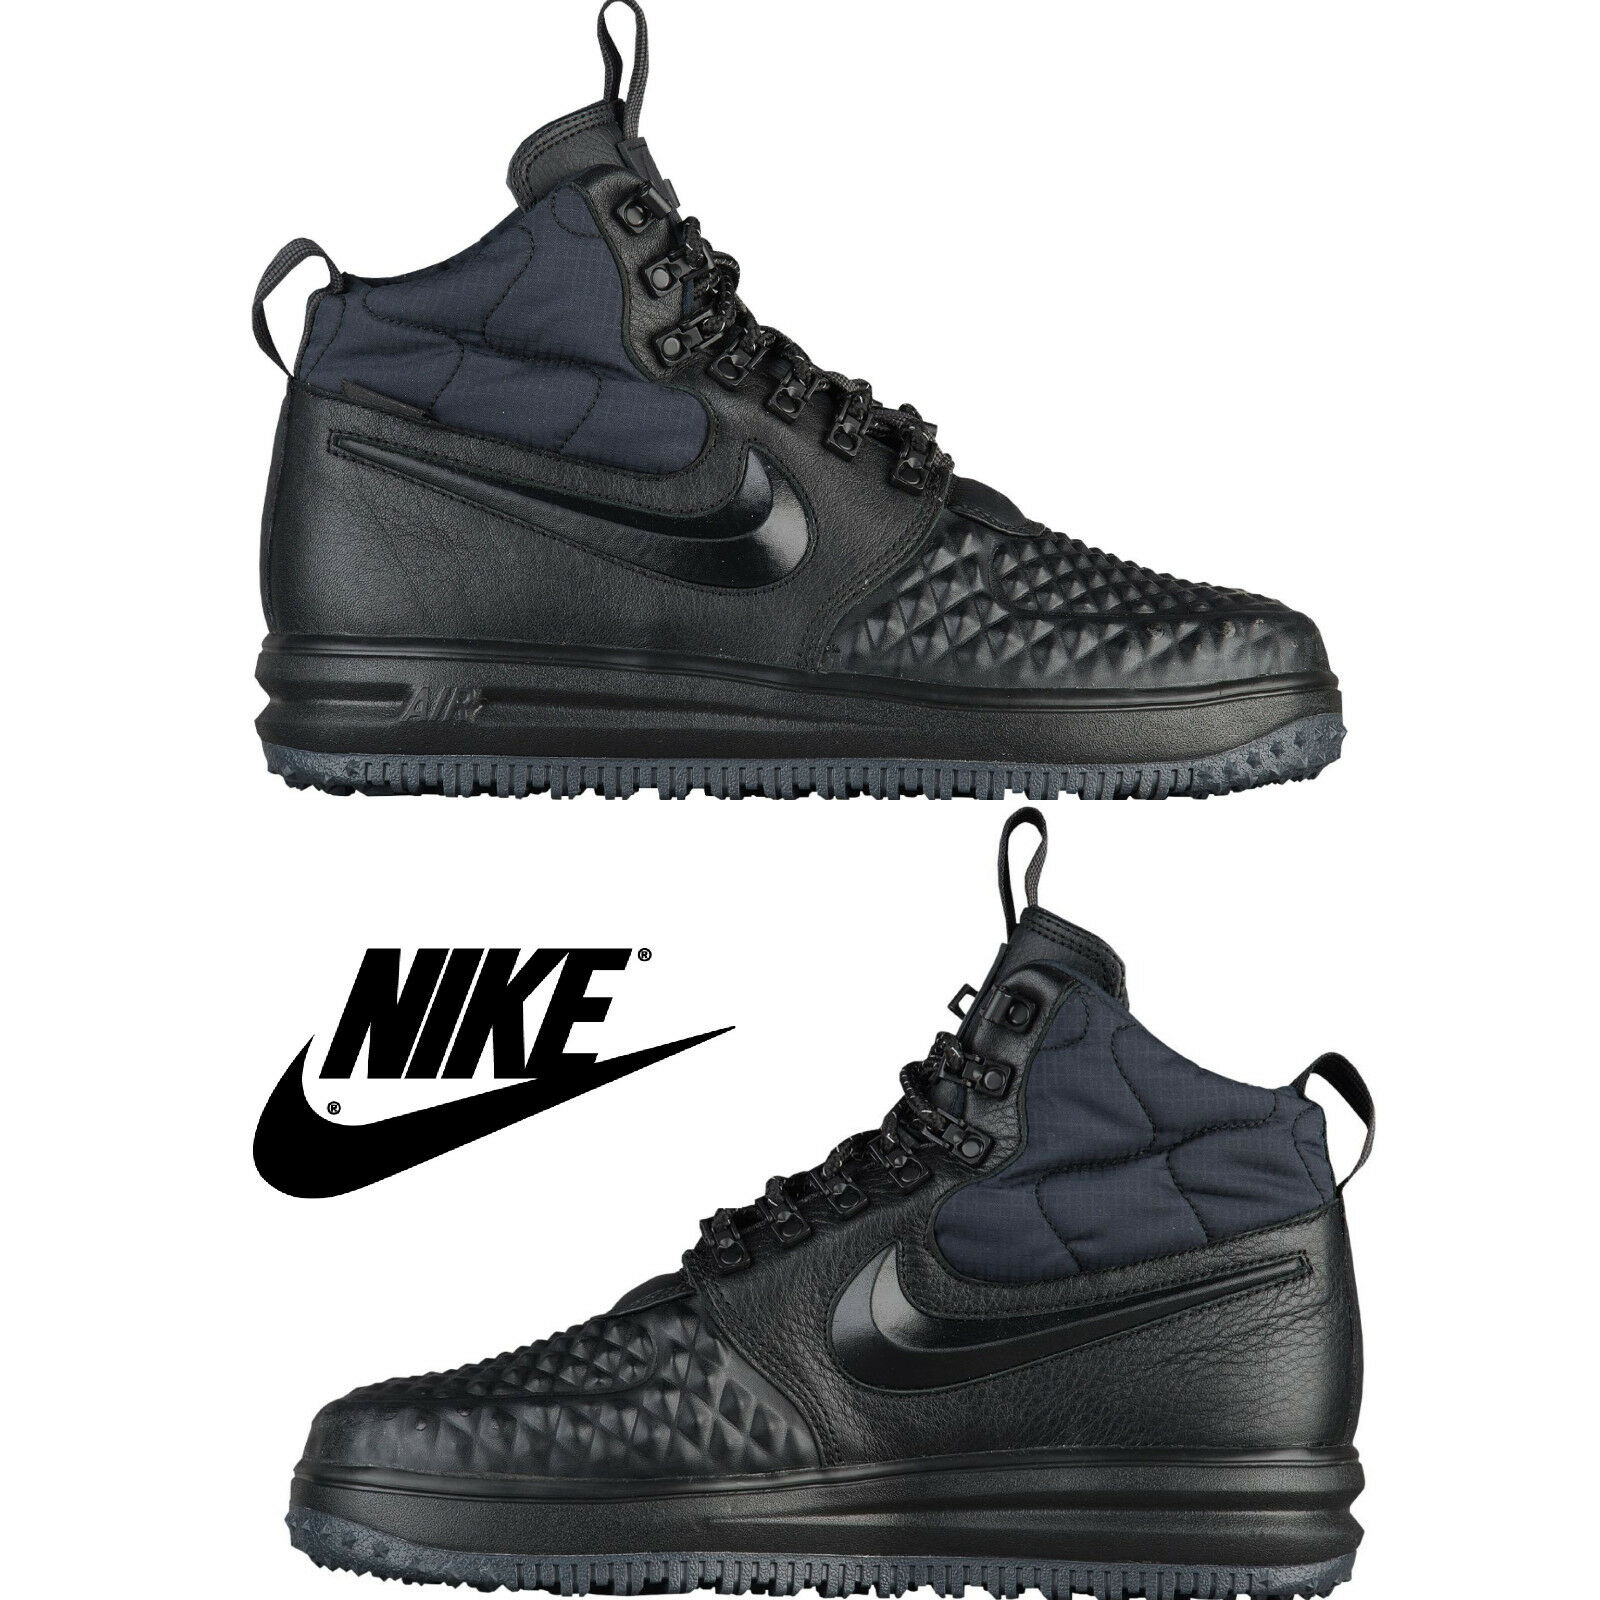 Nike lunar force 1 männer duckStiefel komfort schuhe hoch top sneaker stiefel nib